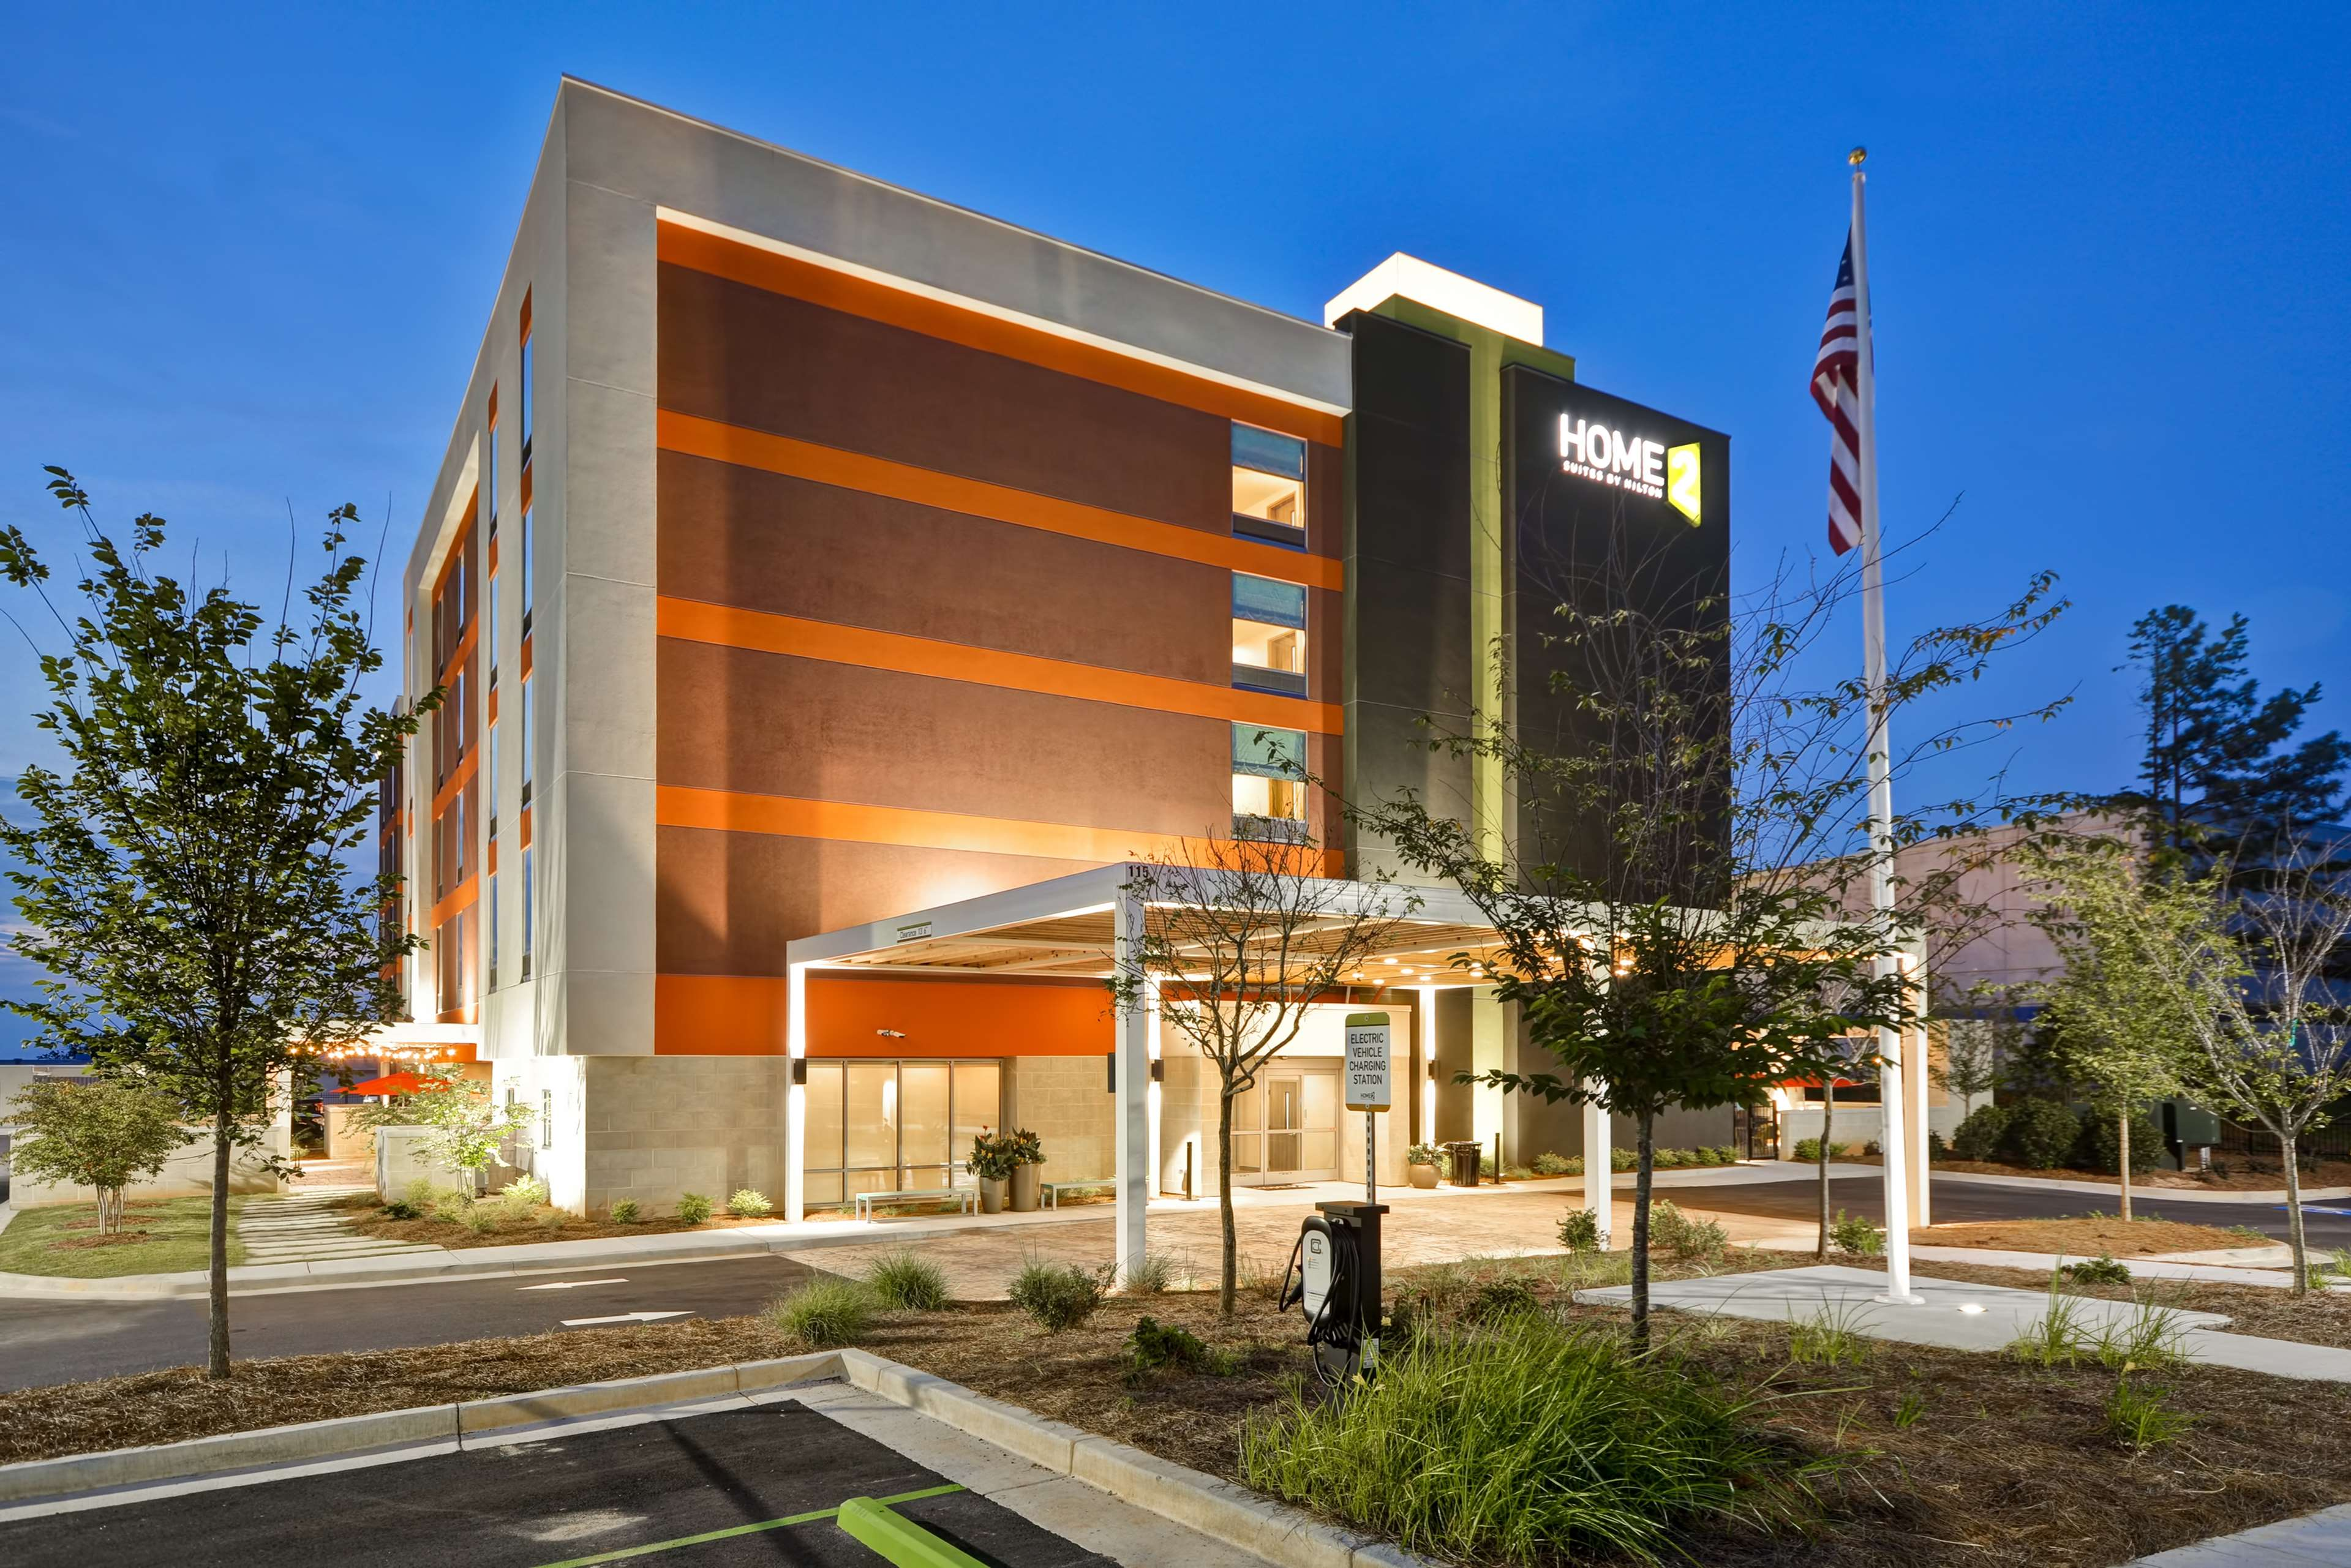 Home2 Suites by Hilton Atlanta West Lithia Springs image 0